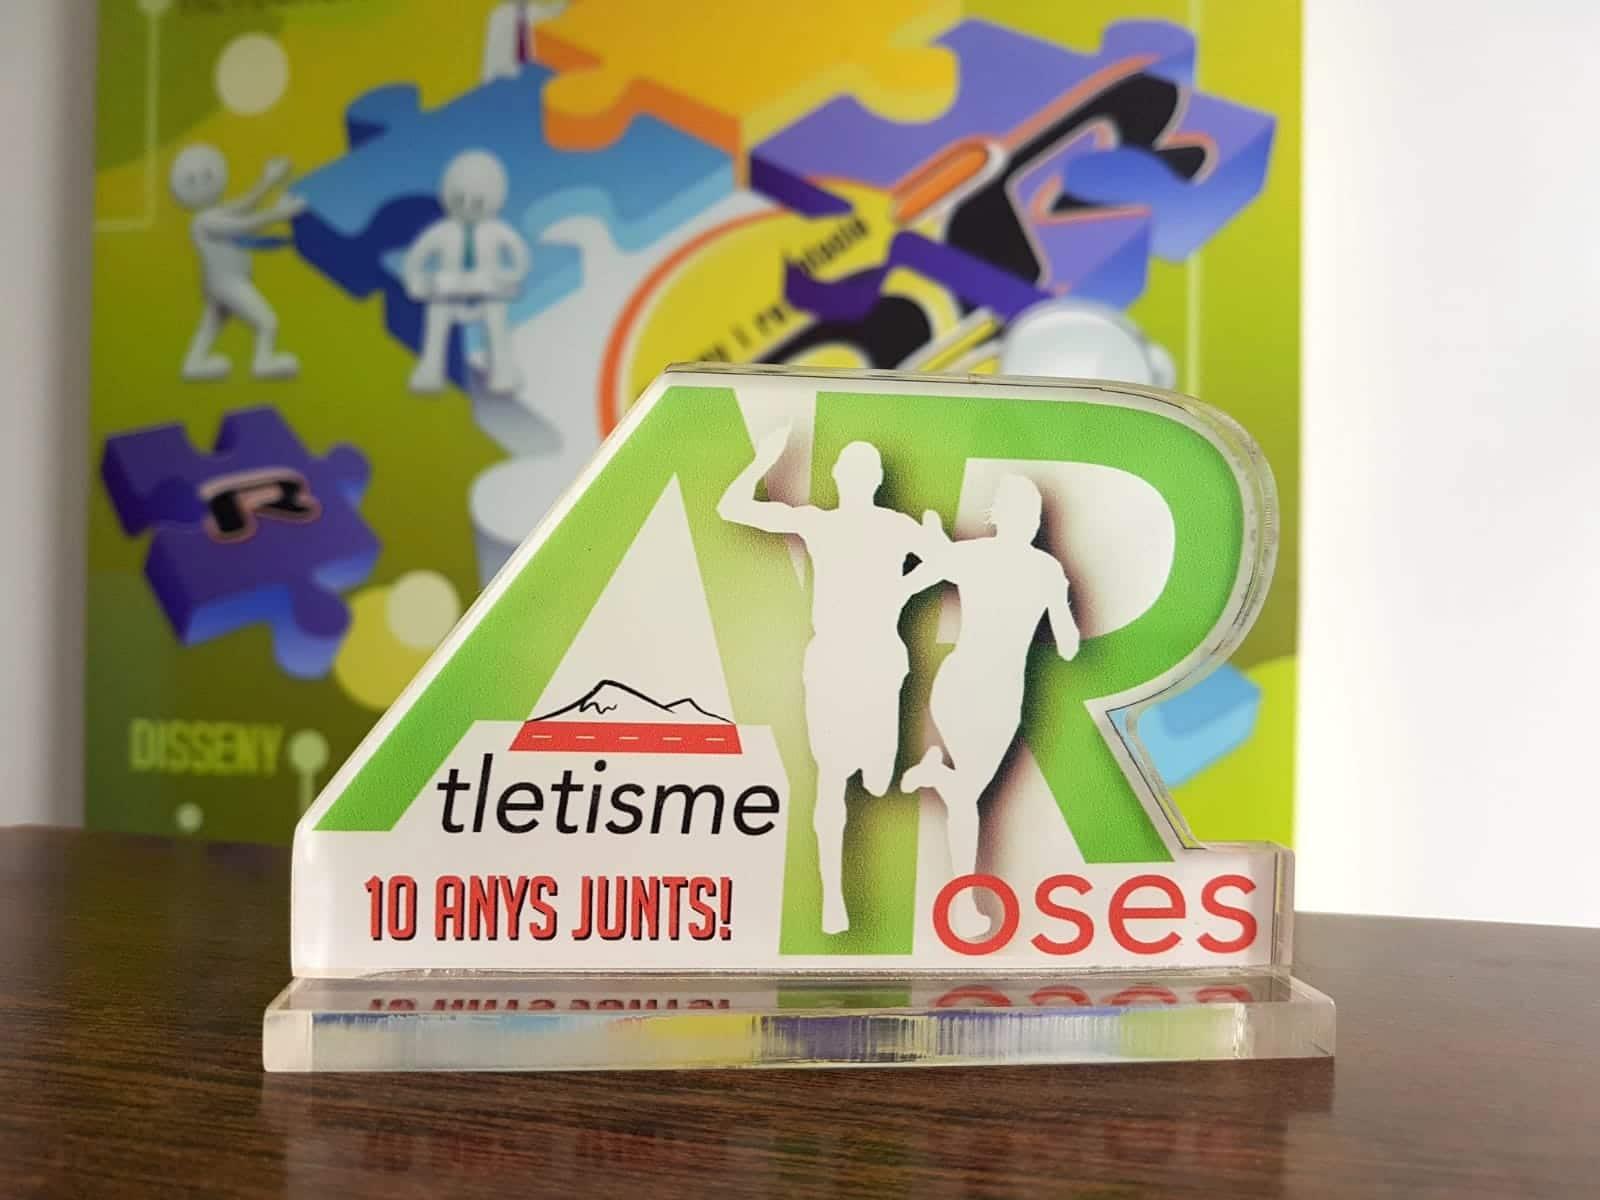 ATLETISMEROSES2 - Portfolio Standard Masonry